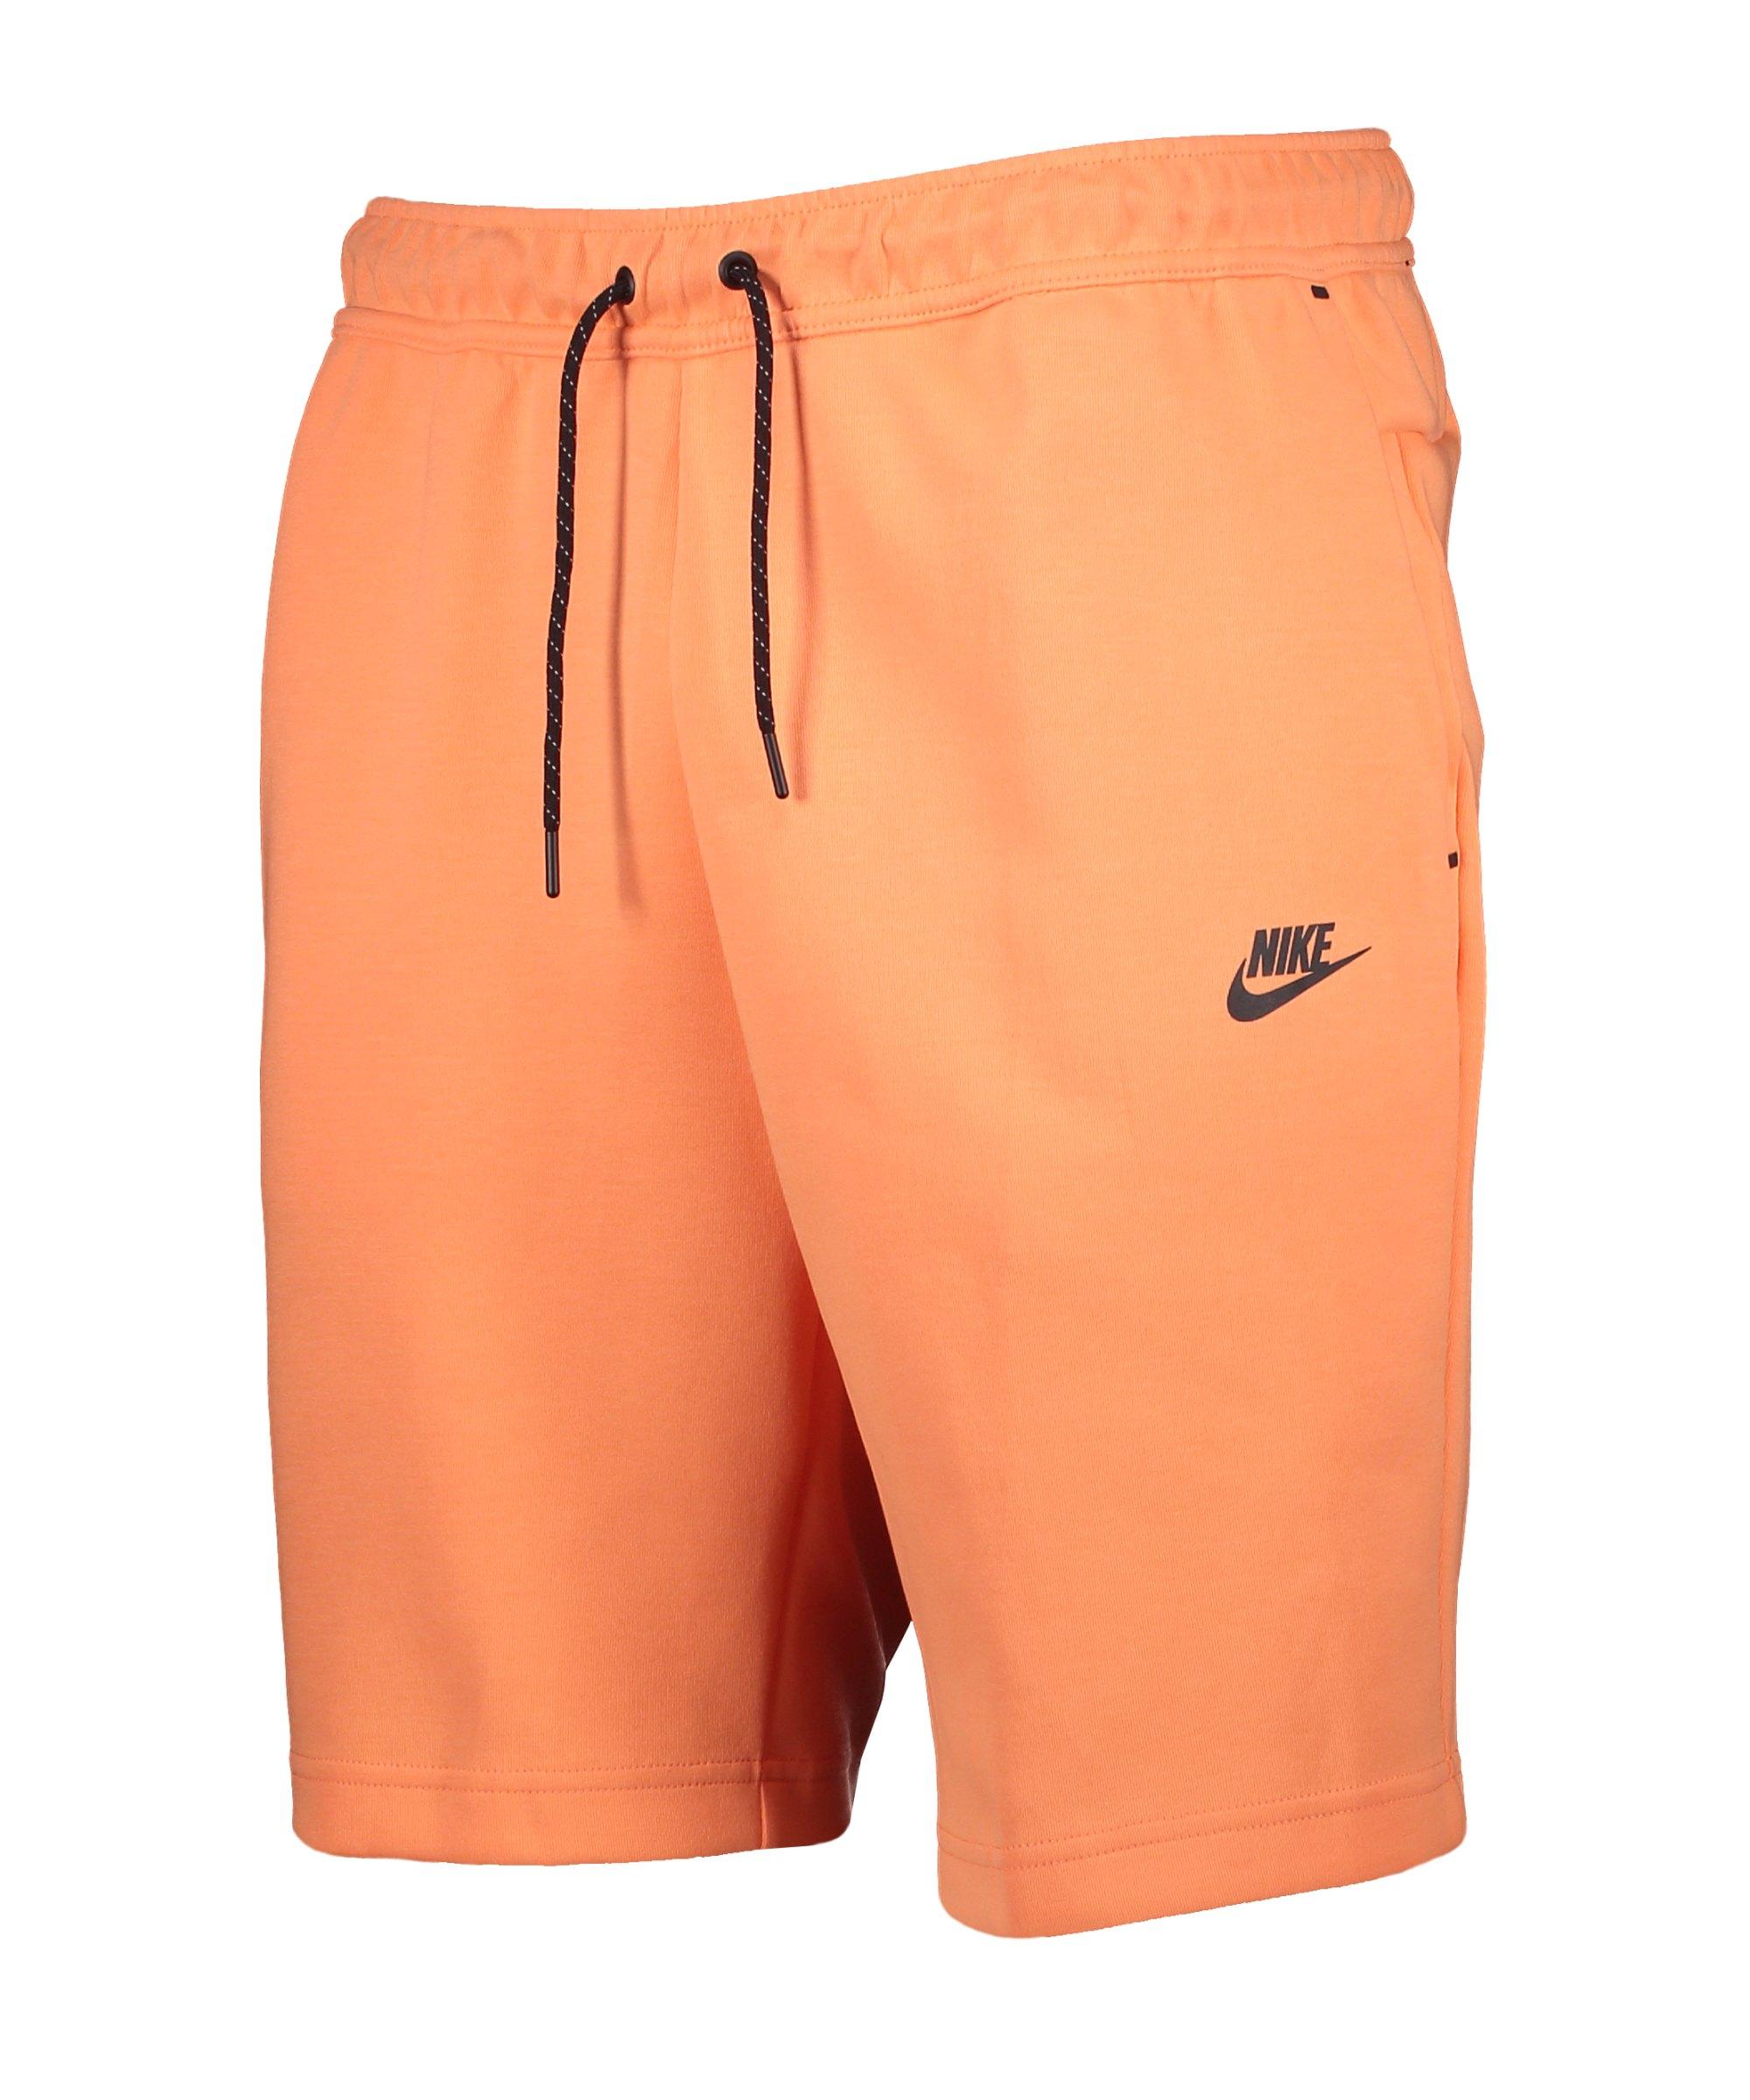 Nike Tech Fleece Short Orange F835 - orange